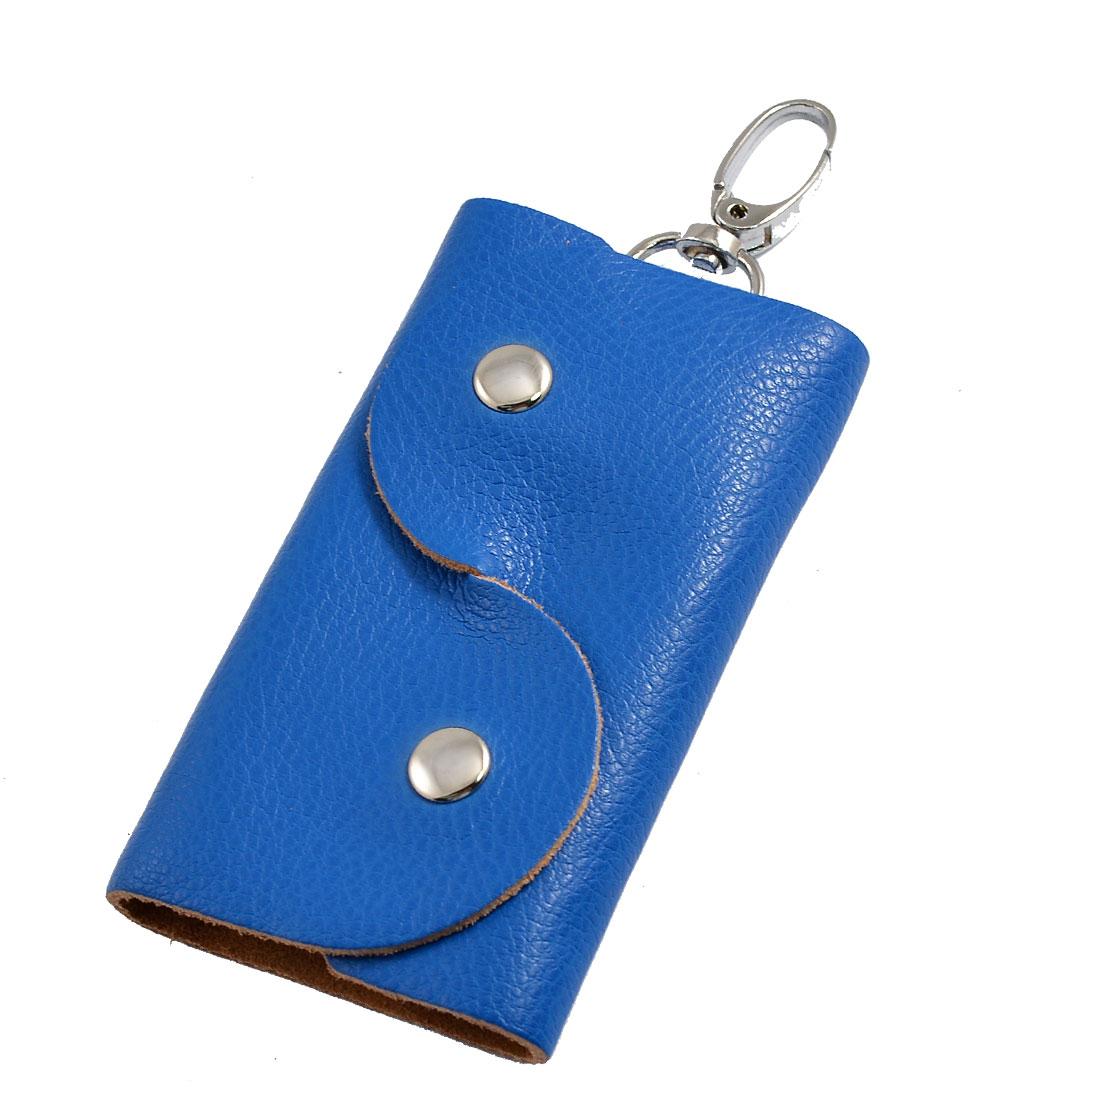 Blue Faux Leather 5 Metal Hooks Folding Key Organizer Holder Bag